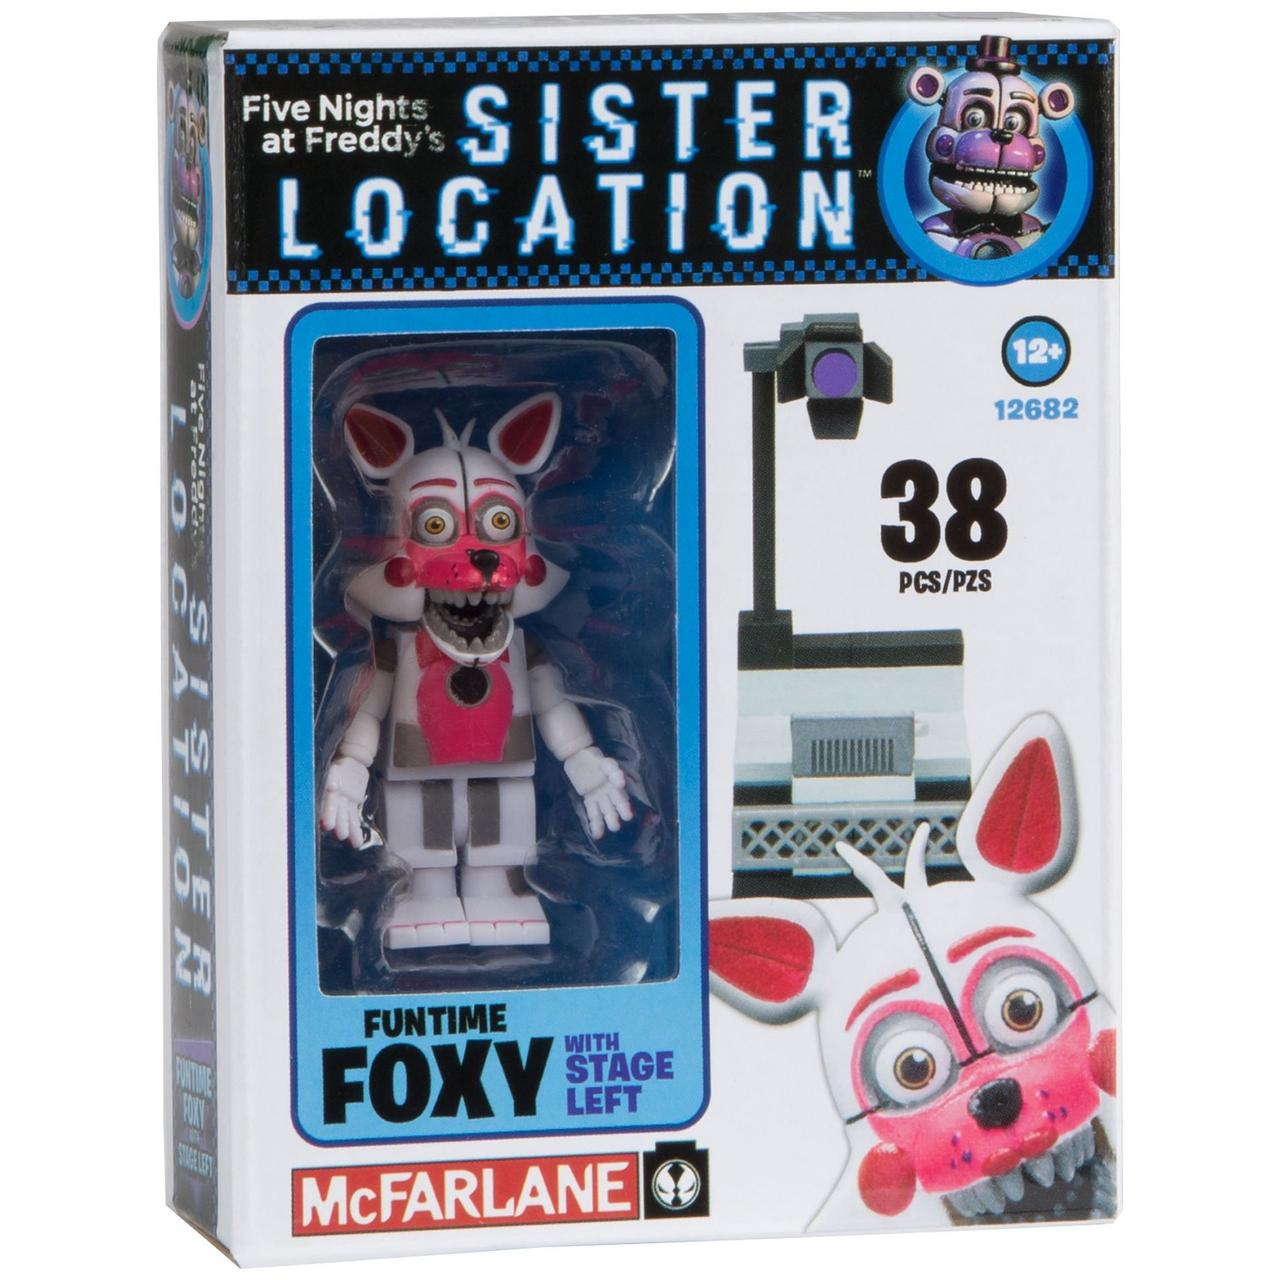 Five Nights at Freddy's Sister Location Конструктор Funtime Foxy 38 деталей